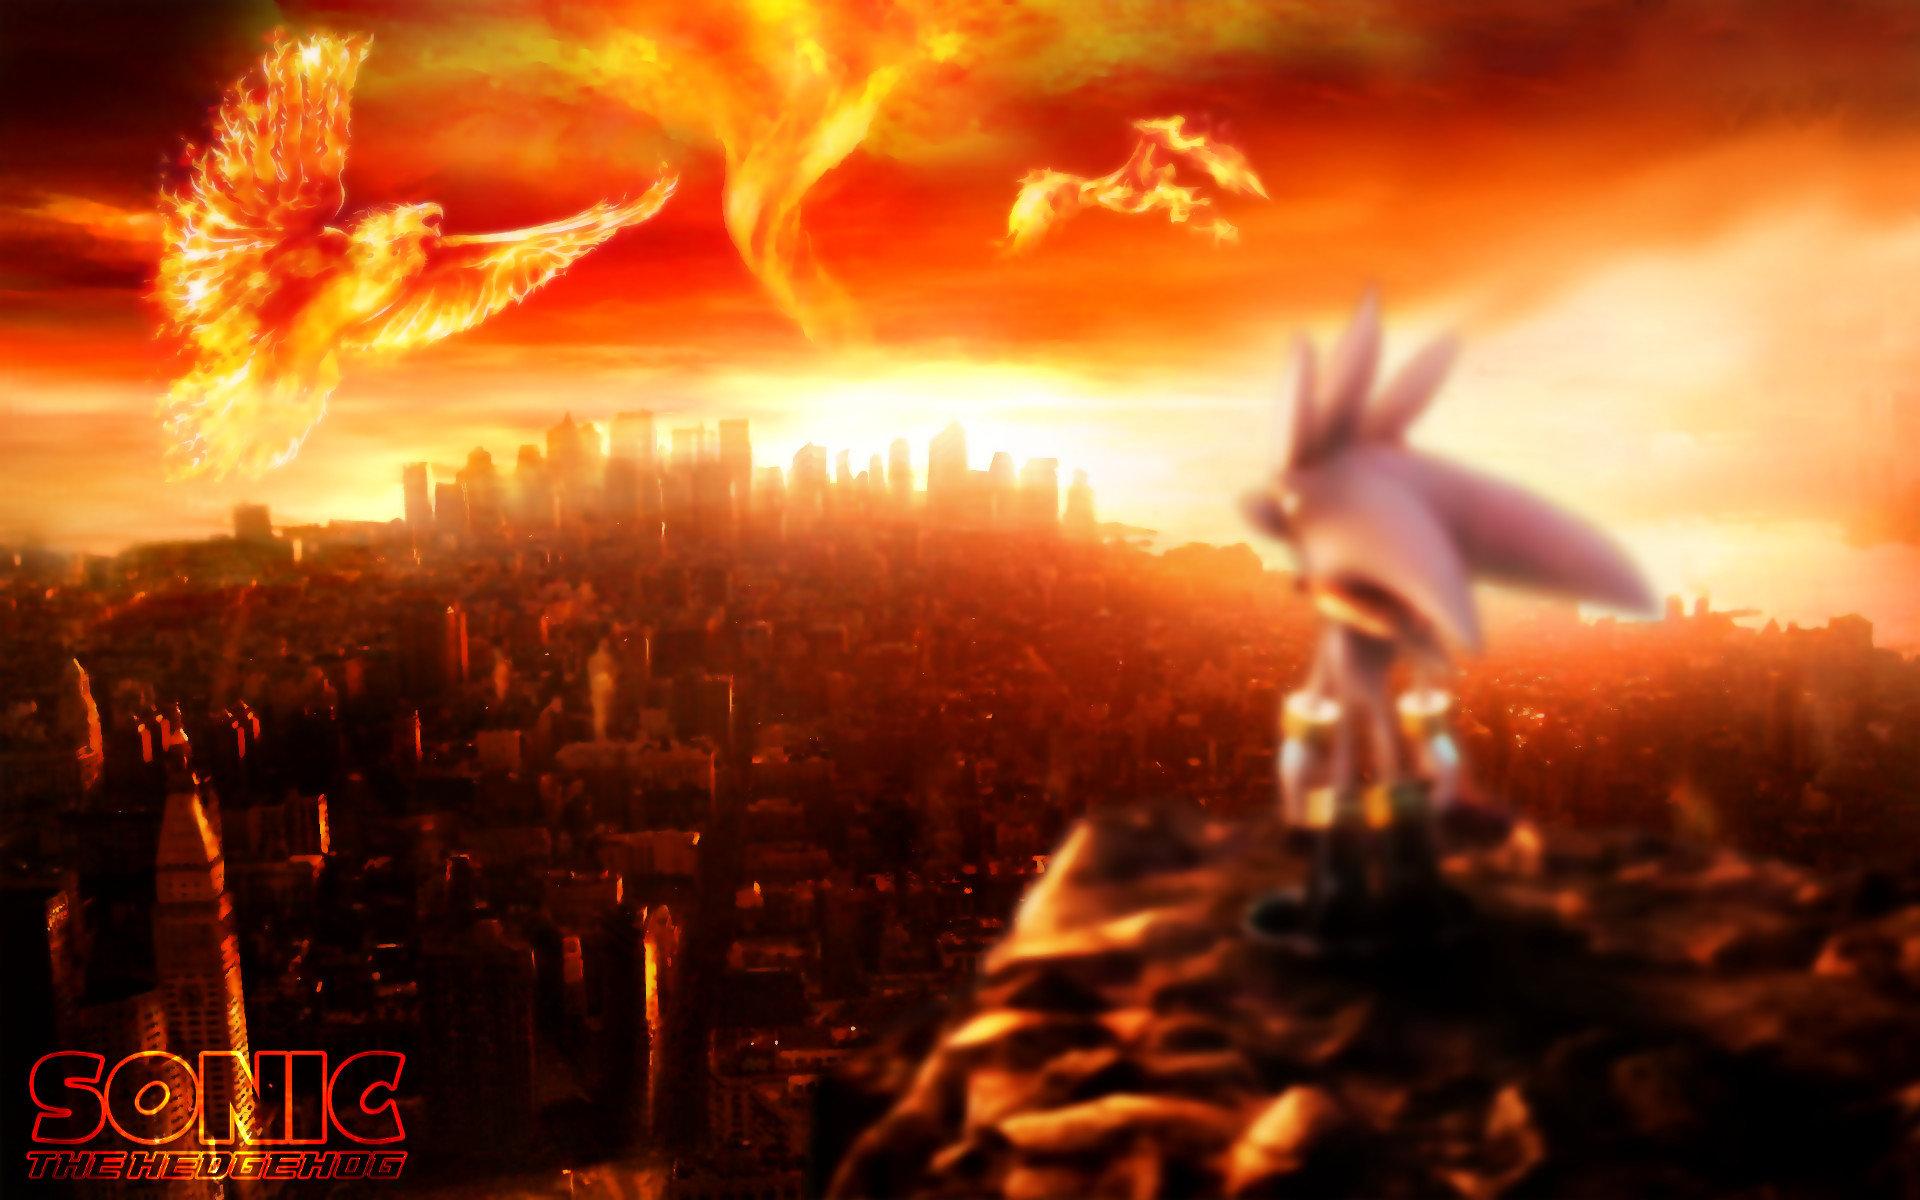 Sonic The Hedgehog 2006 Wallpapers Hd For Desktop Backgrounds